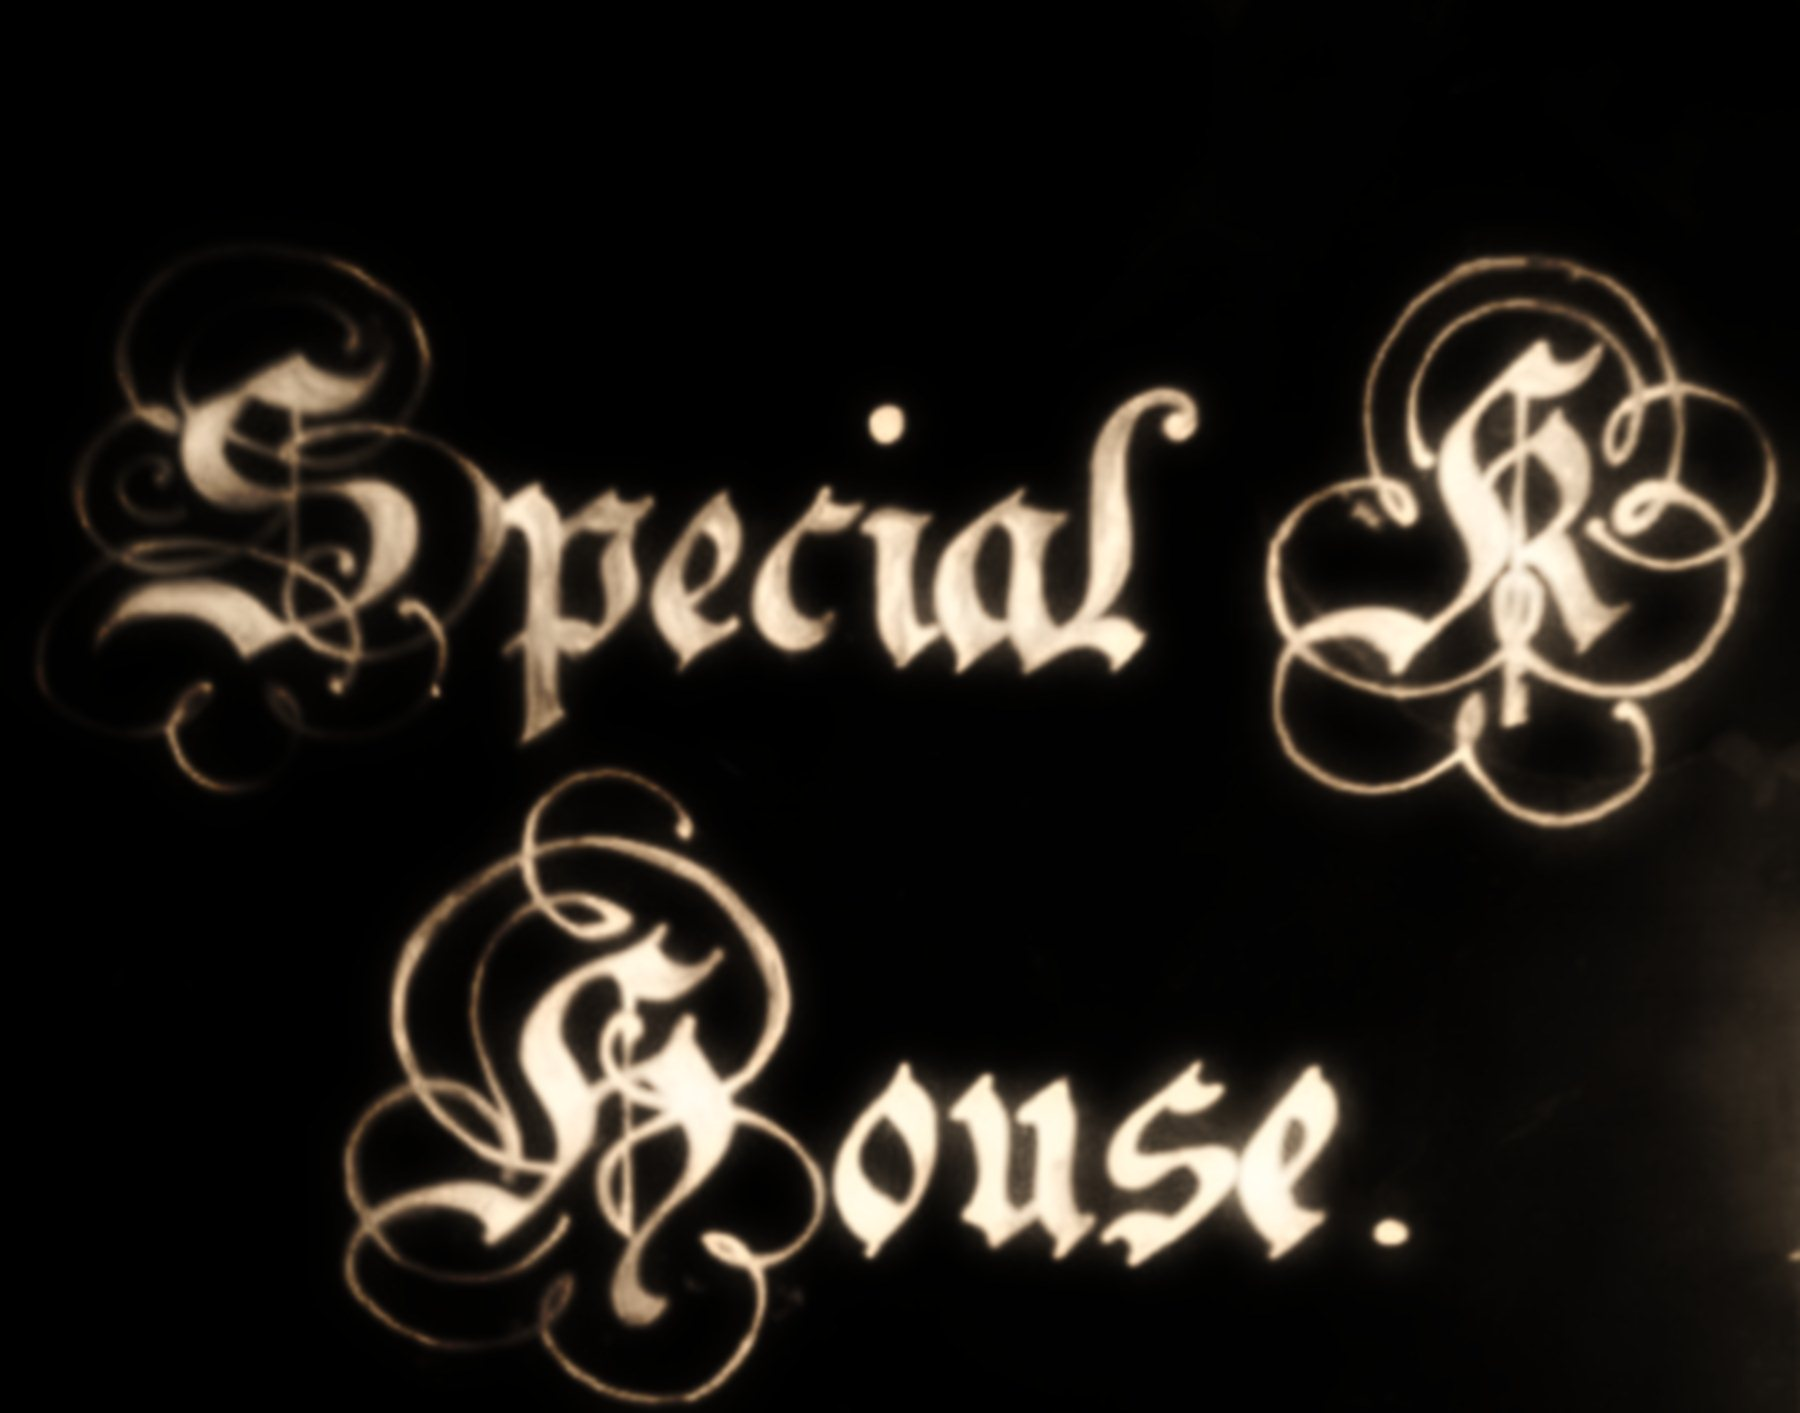 specii special k house download zippy